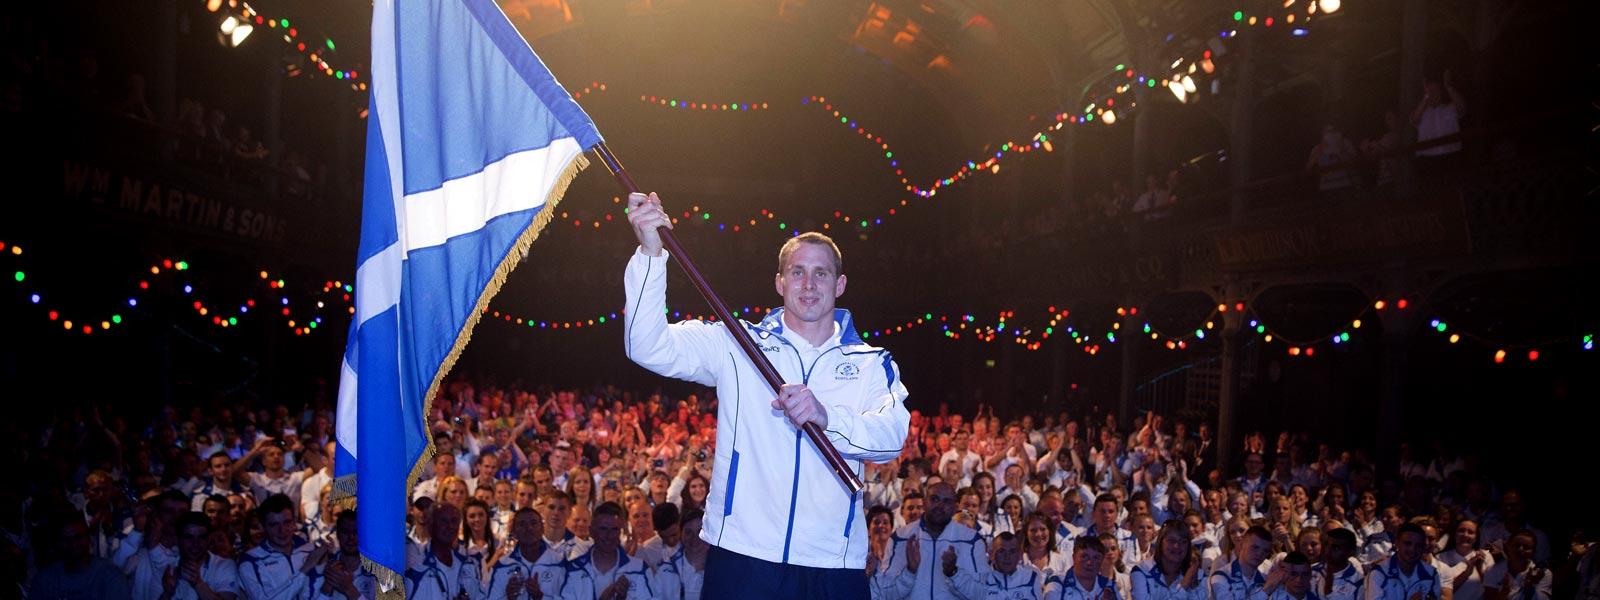 About James Stevenson (Flags) - Stevenson Flags